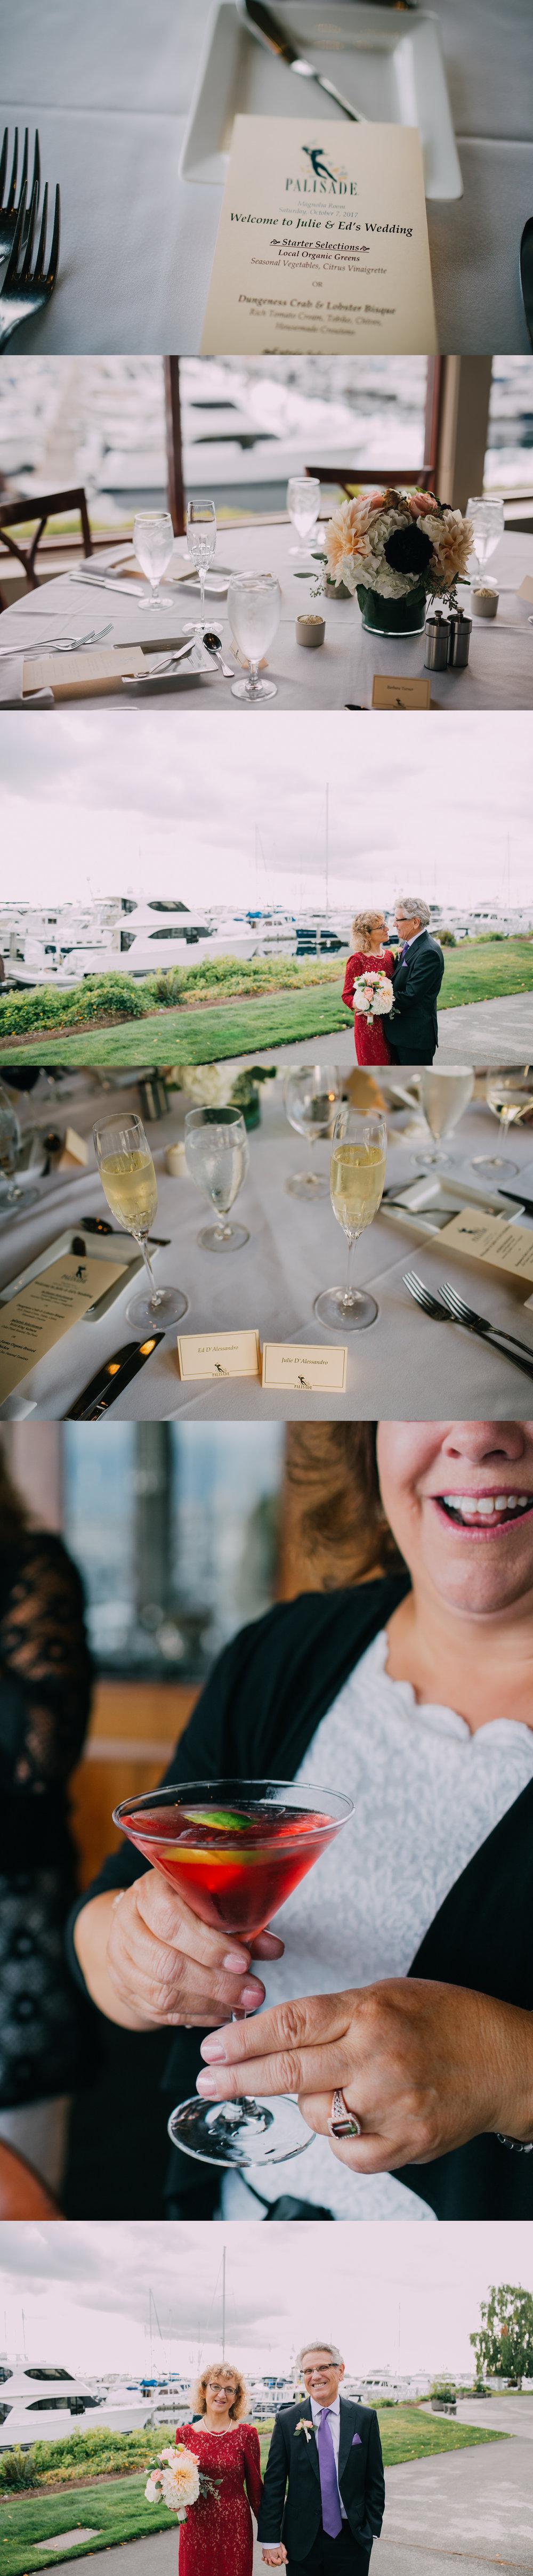 intimate small wedding photographer seattle washington pnw restaurant reception -1.jpg